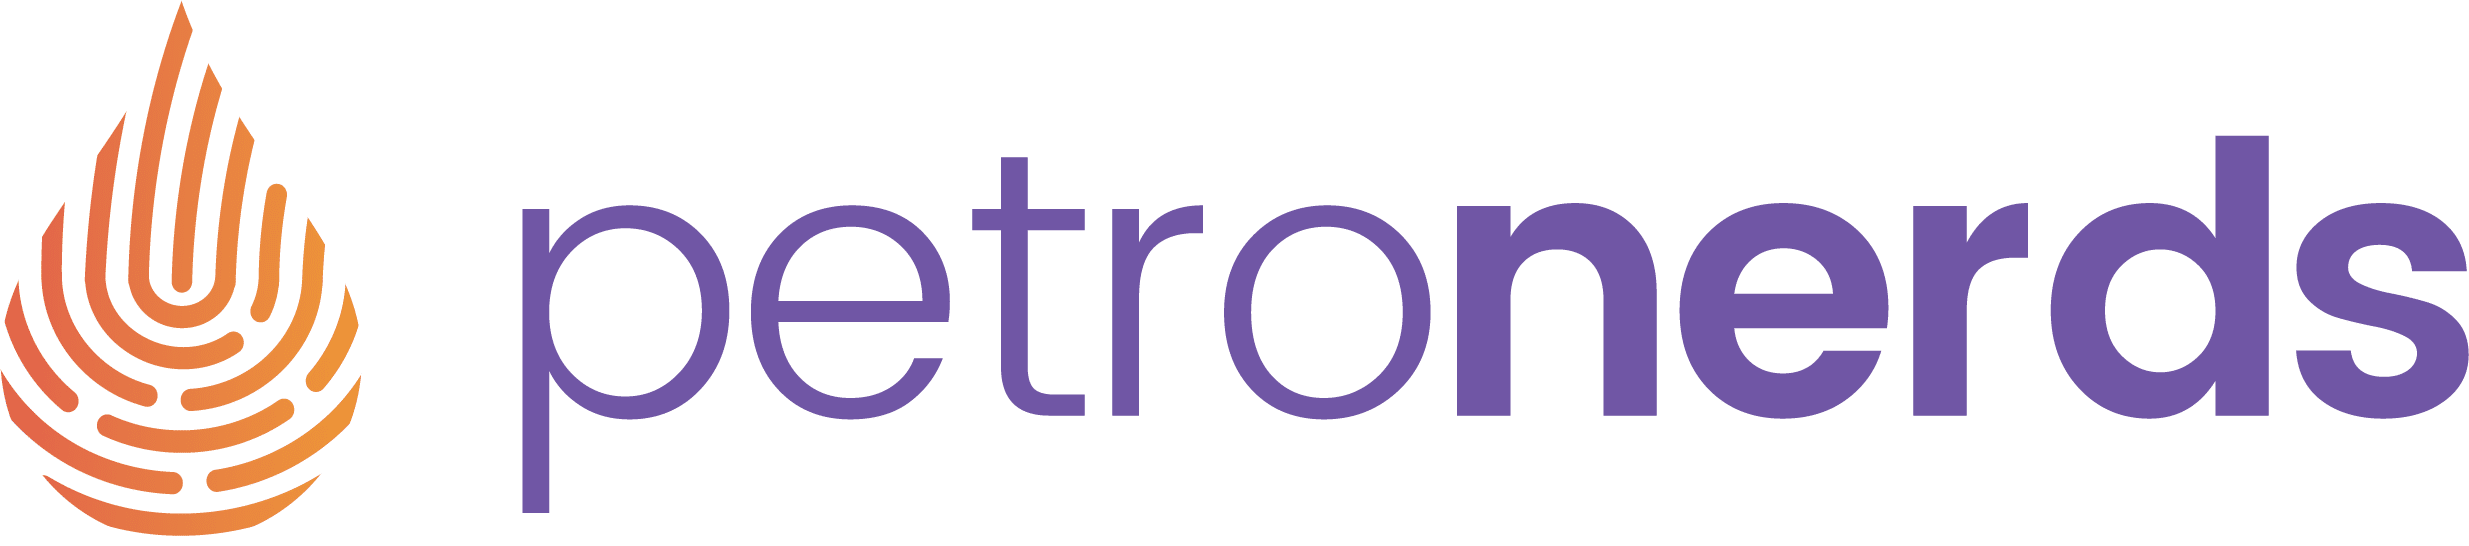 PetroNerds Logo